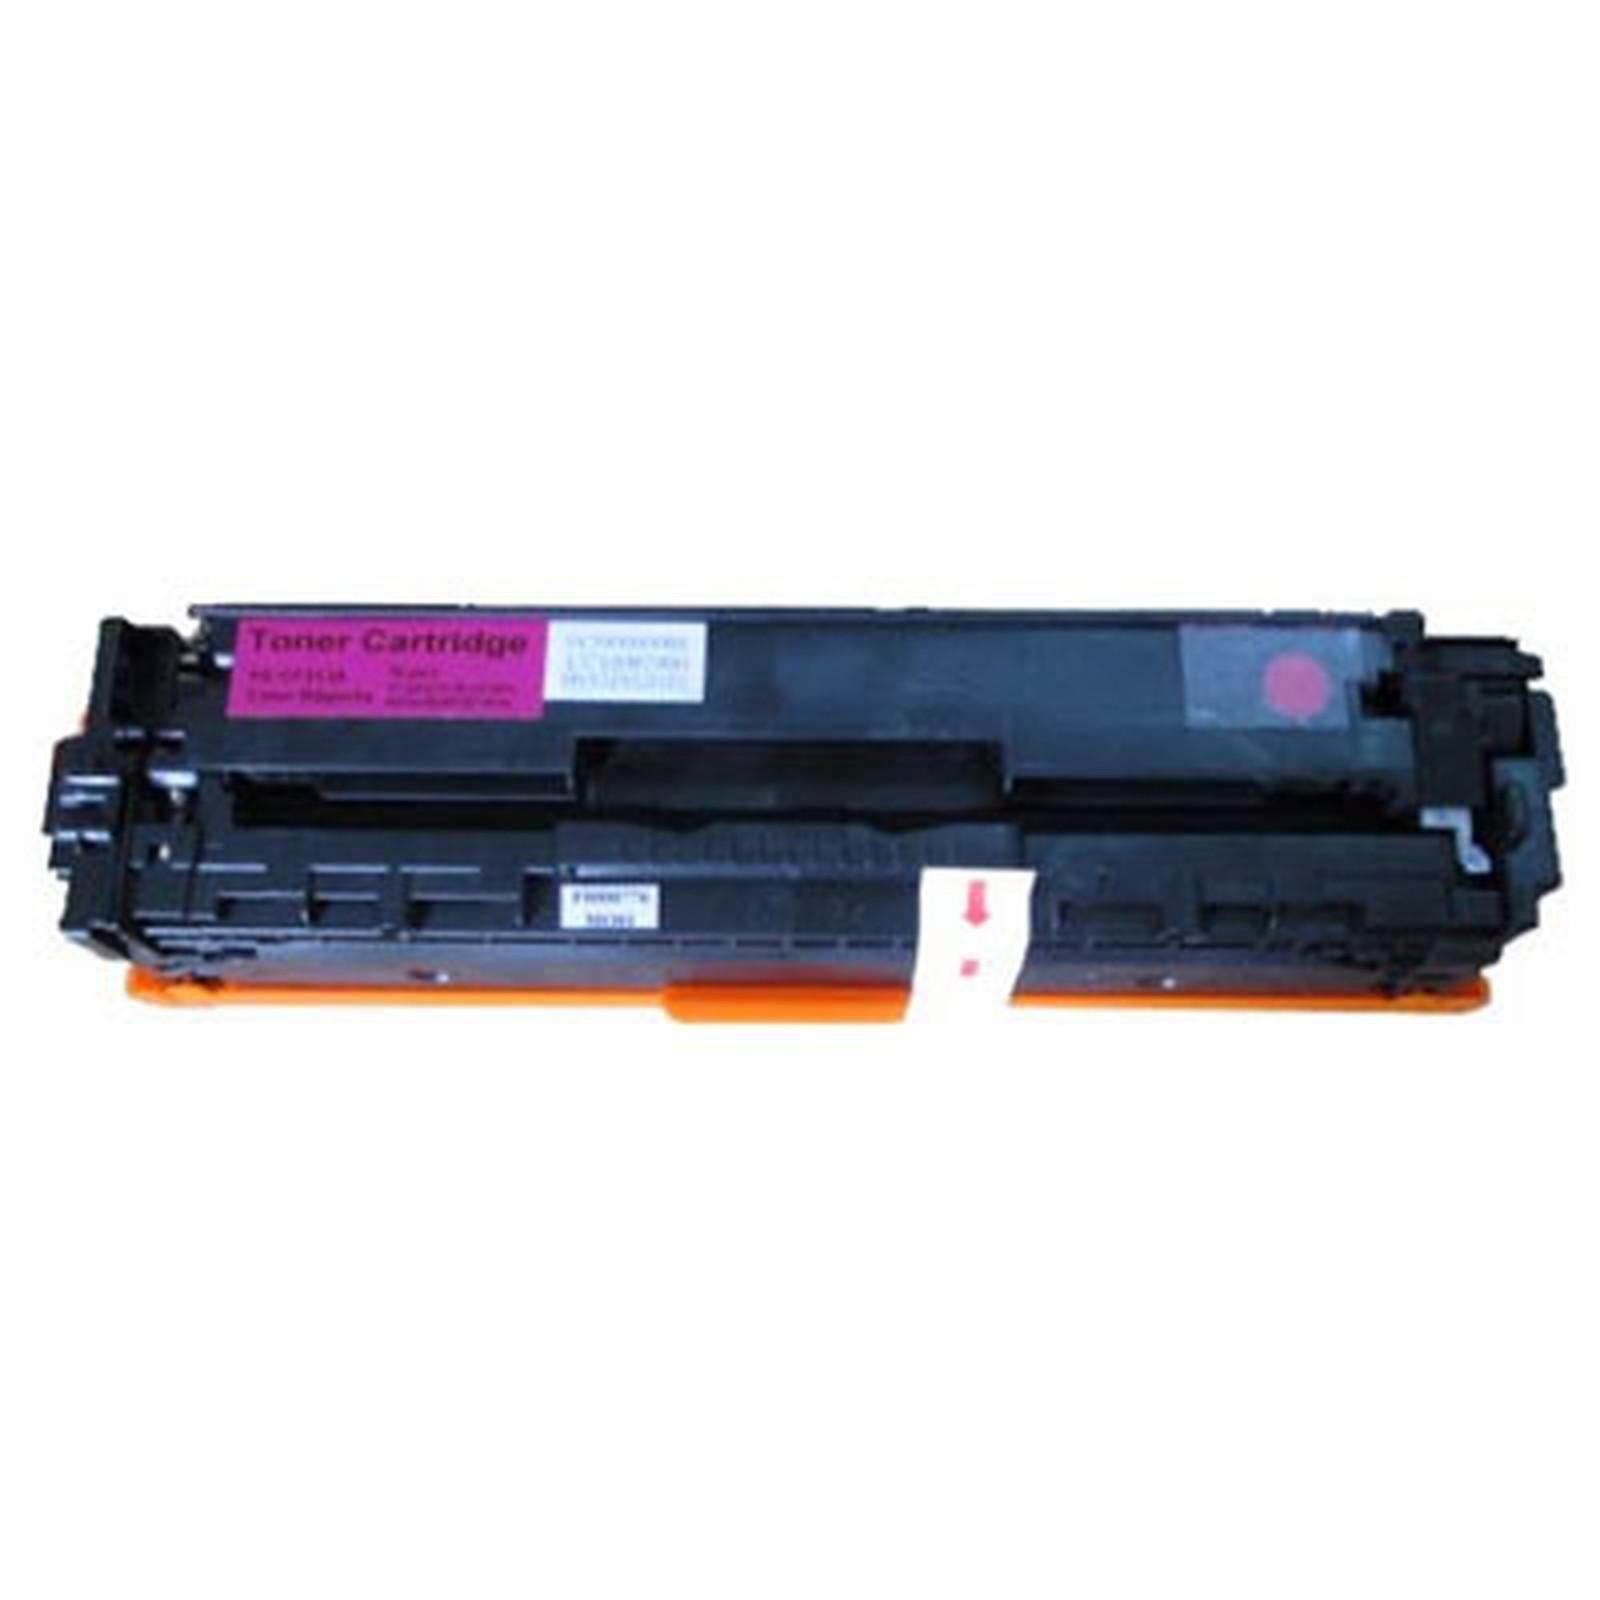 Toner compatible HP 131A / Canon 731 M (Magenta)